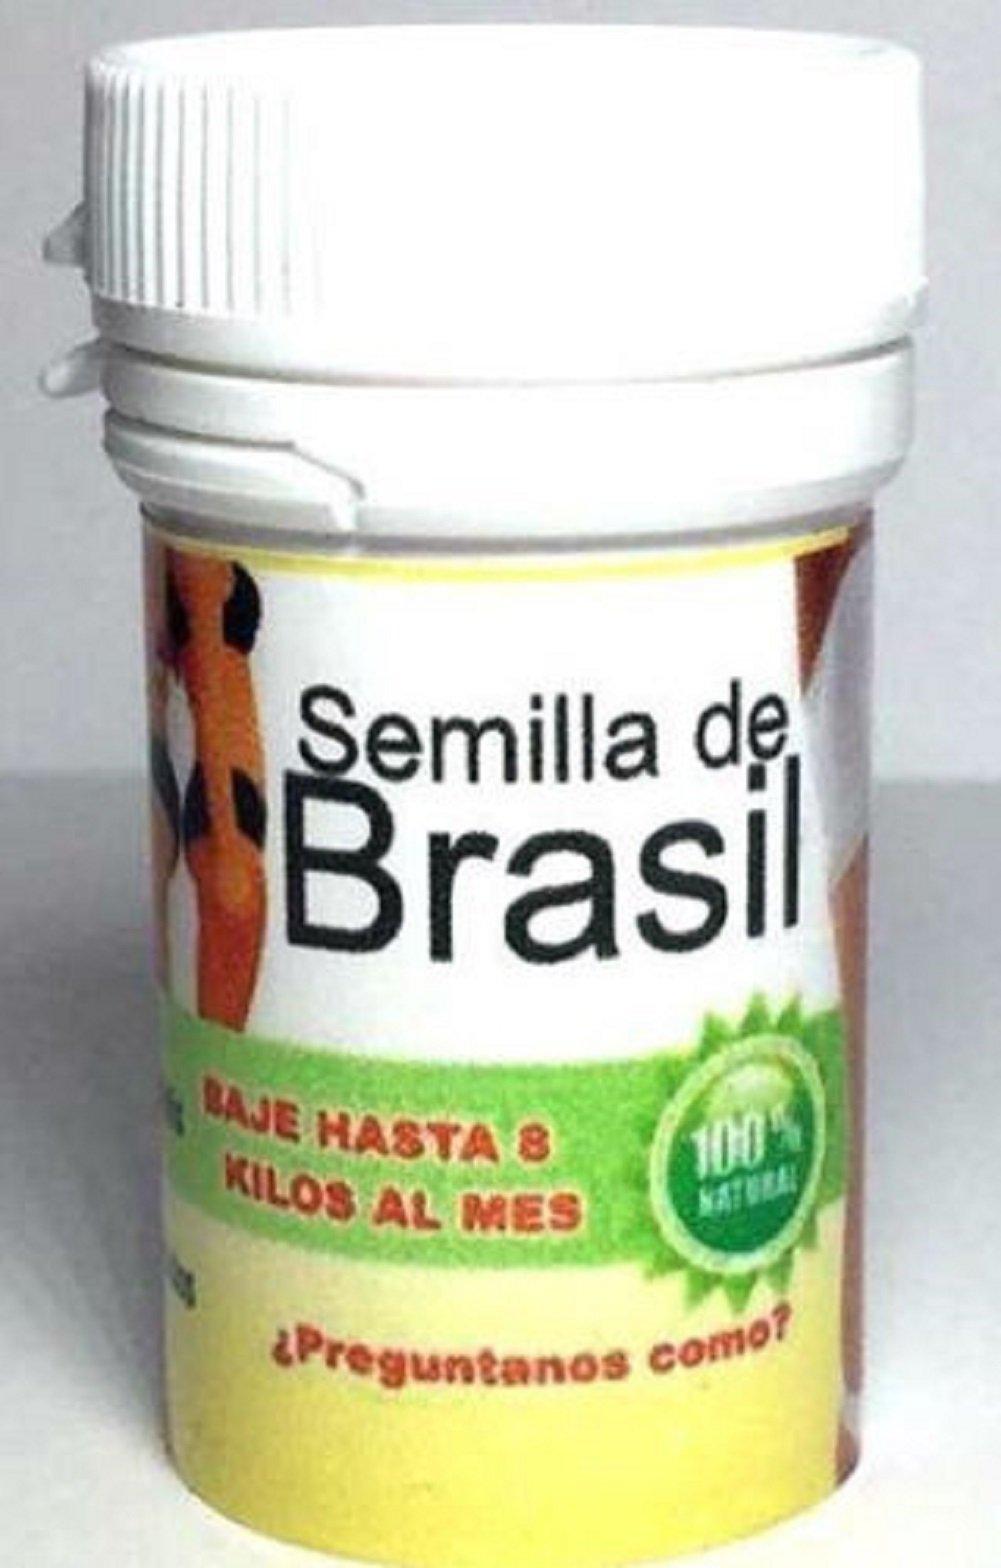 Semilla de Brasil Seed Original Brazilian Natural Weight Loss 30 Seeds For 30 day